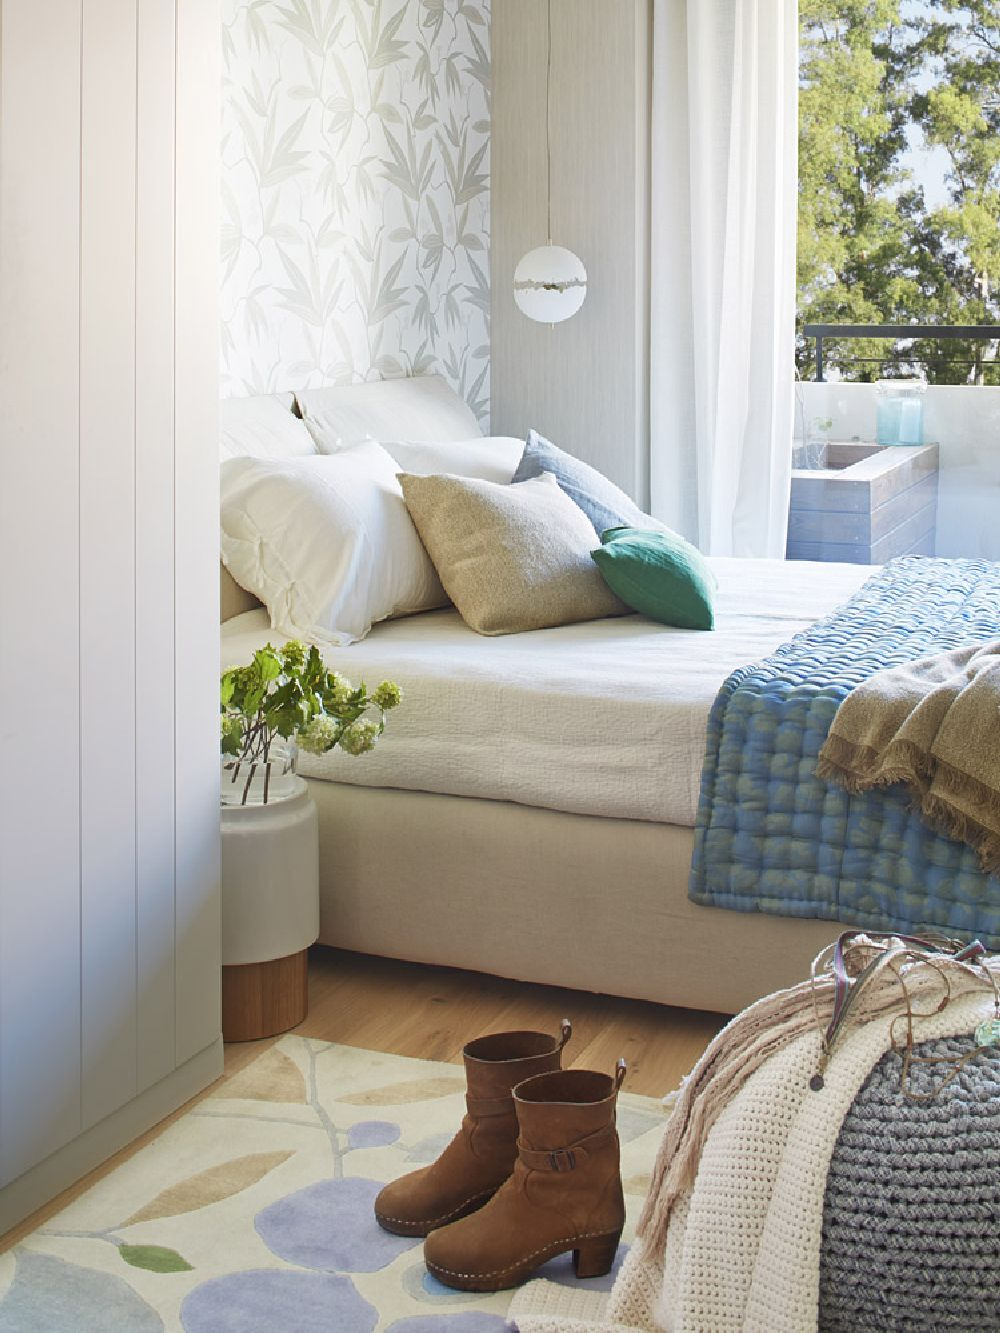 adelaparvu.com despre apartament cu aer mediteranean, design interior Meritxell Ribe (11)